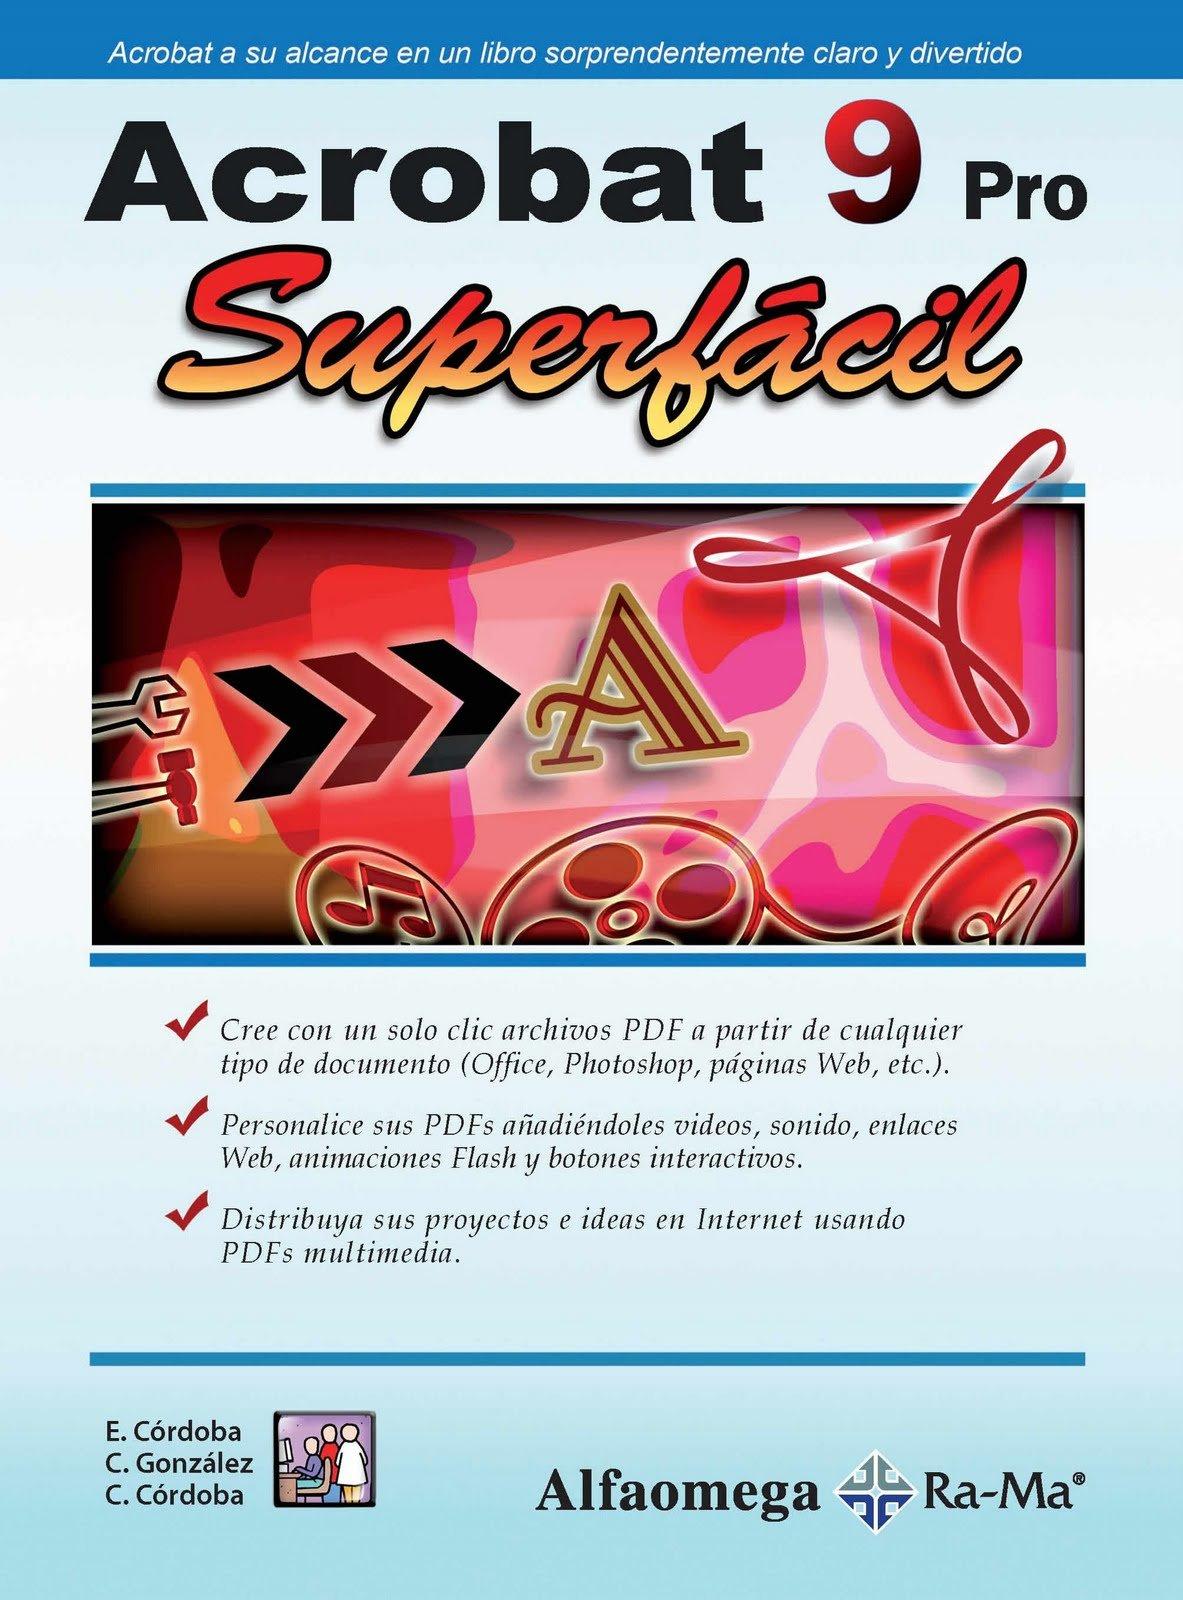 Acrobat 9 pro, SUPERFACIL (Spanish Edition): Carmen CORDOBA, Carmen GONZALEZ, Enrique CORDOBA, Alfaomega Grupo Editor (MX), ...